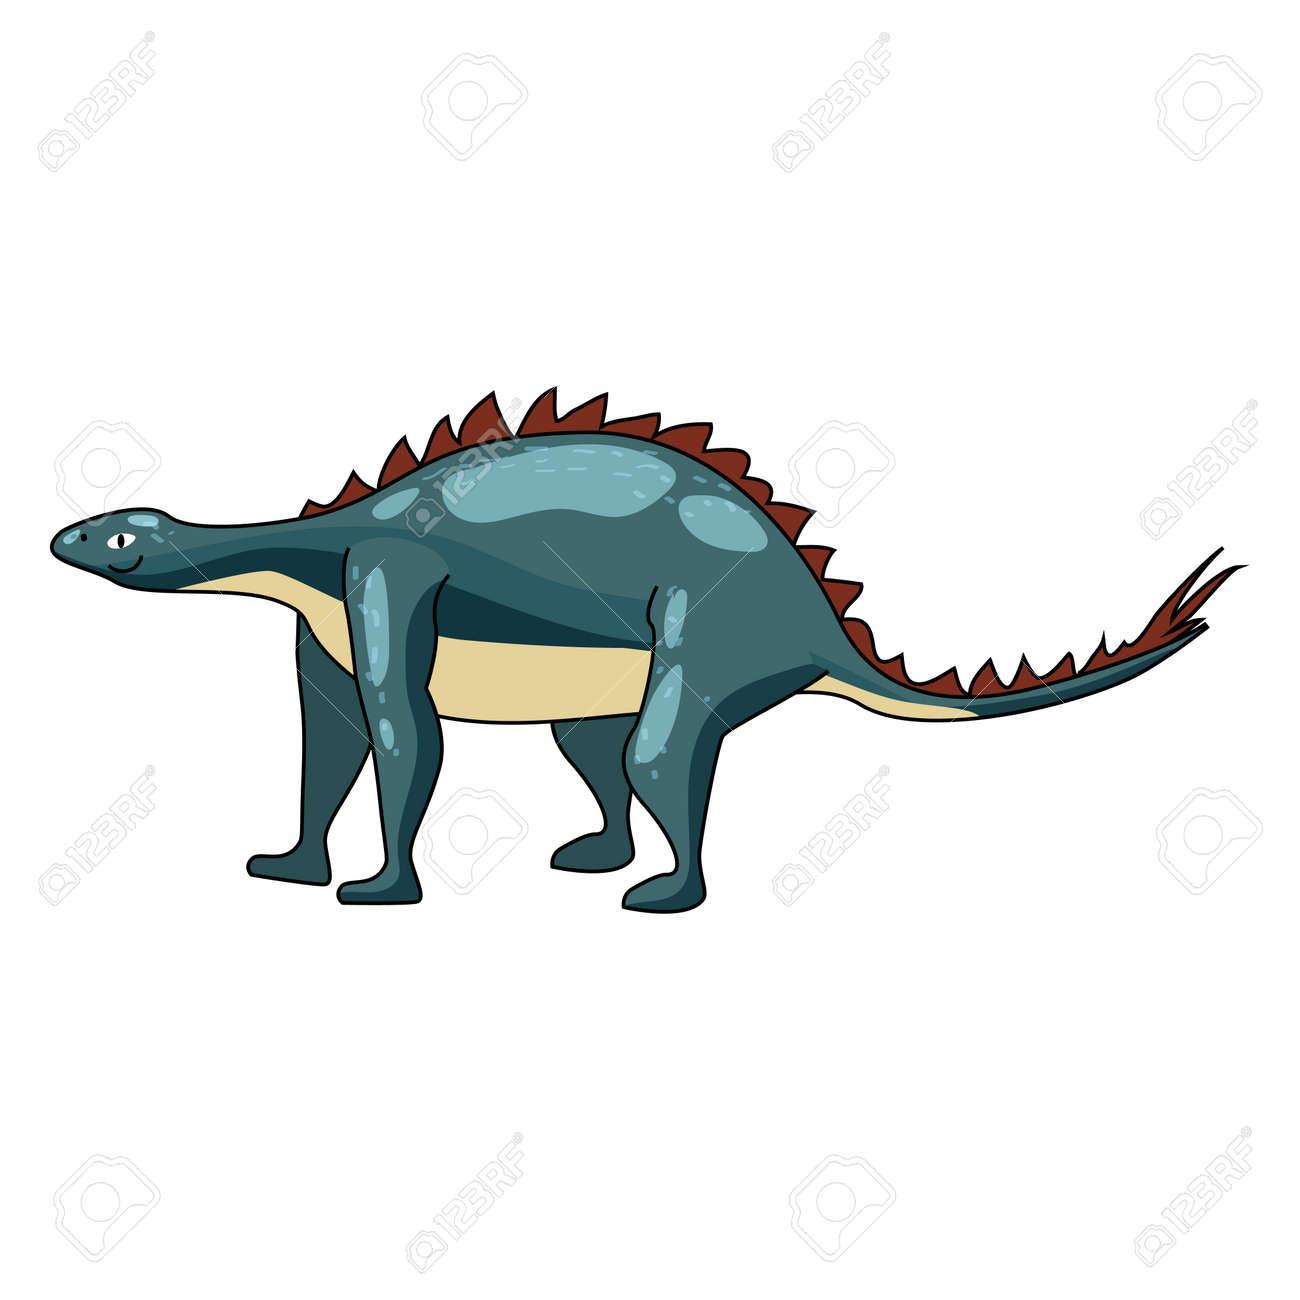 Funny prehistoric Stegosaurus dinosaurus. Ancient wild monsters reptiles cartoon style. Vector isolated - 171875855